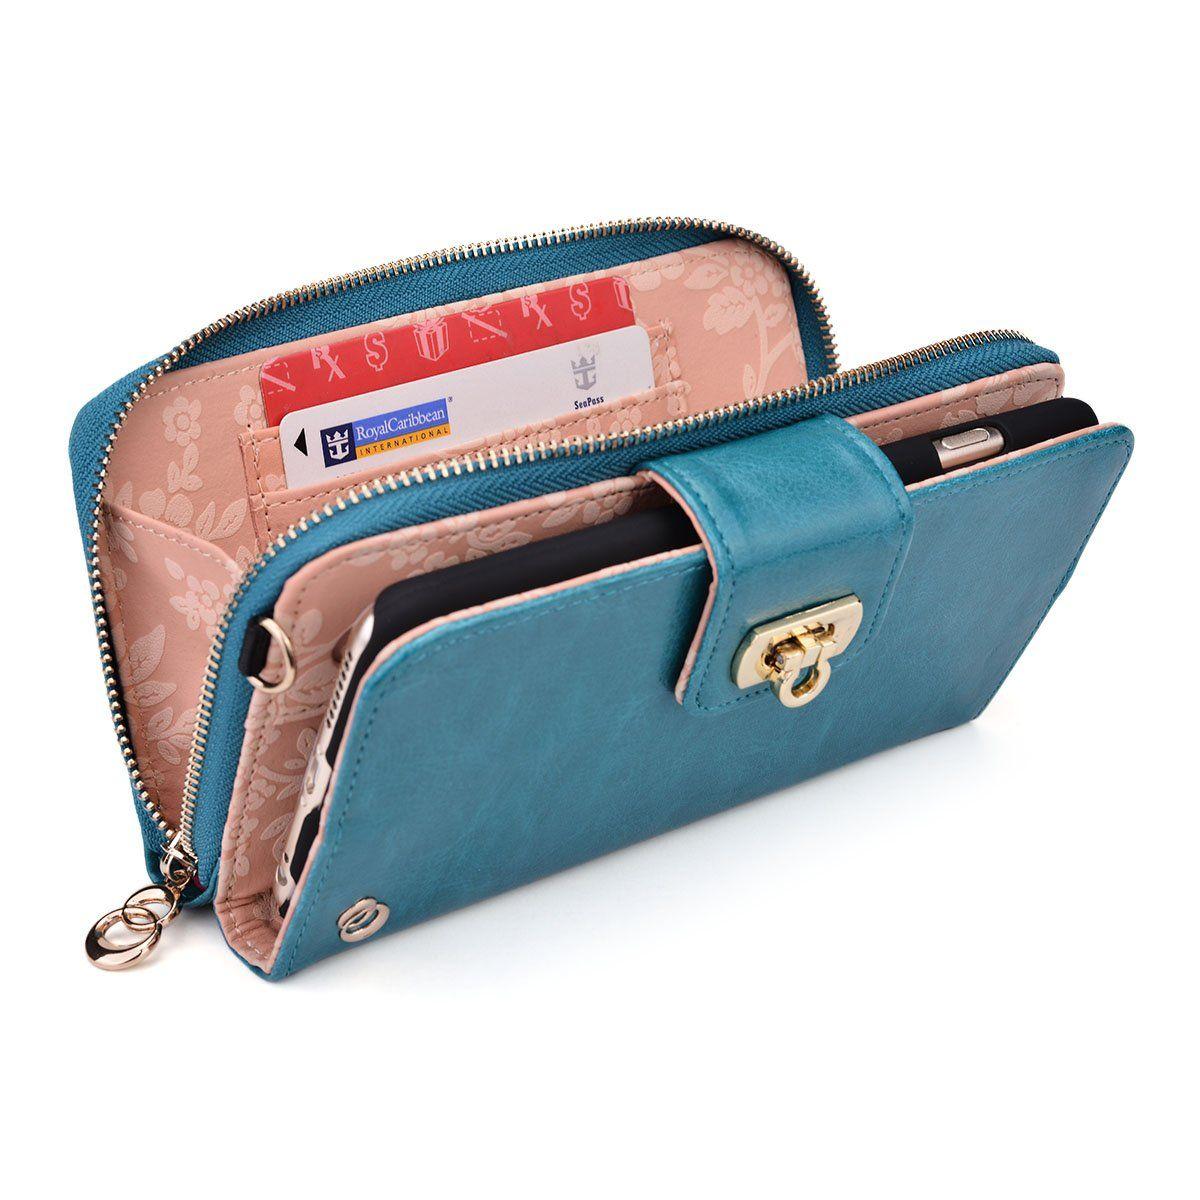 purse phone case iphone 6